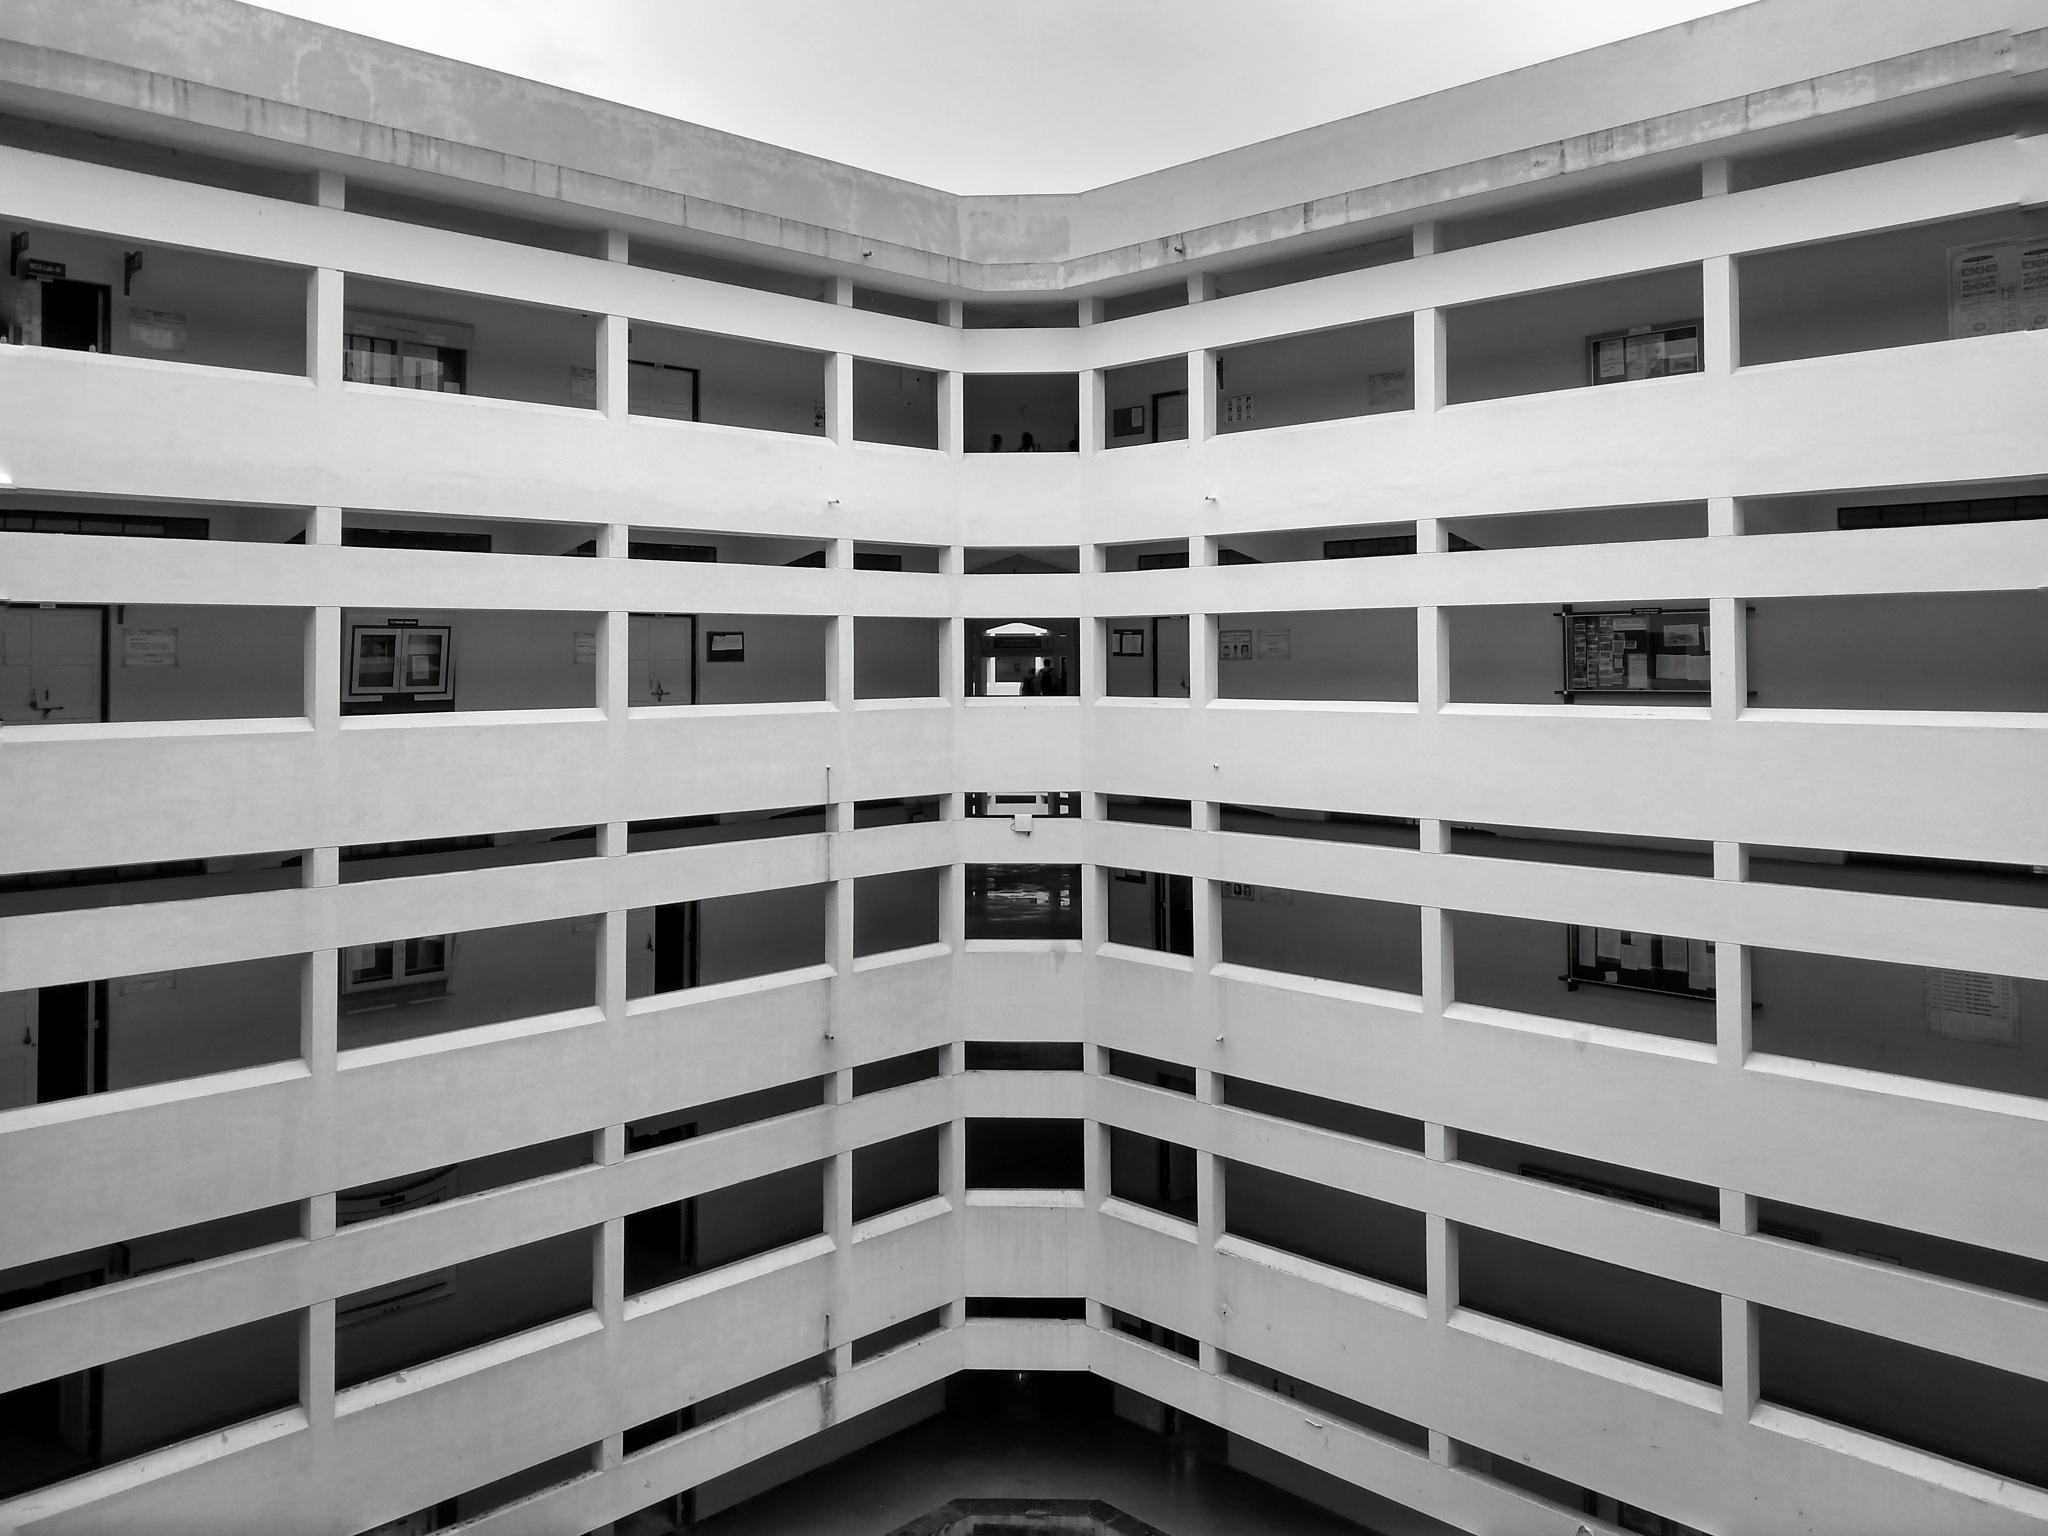 Symmetry! by subodhtapase08